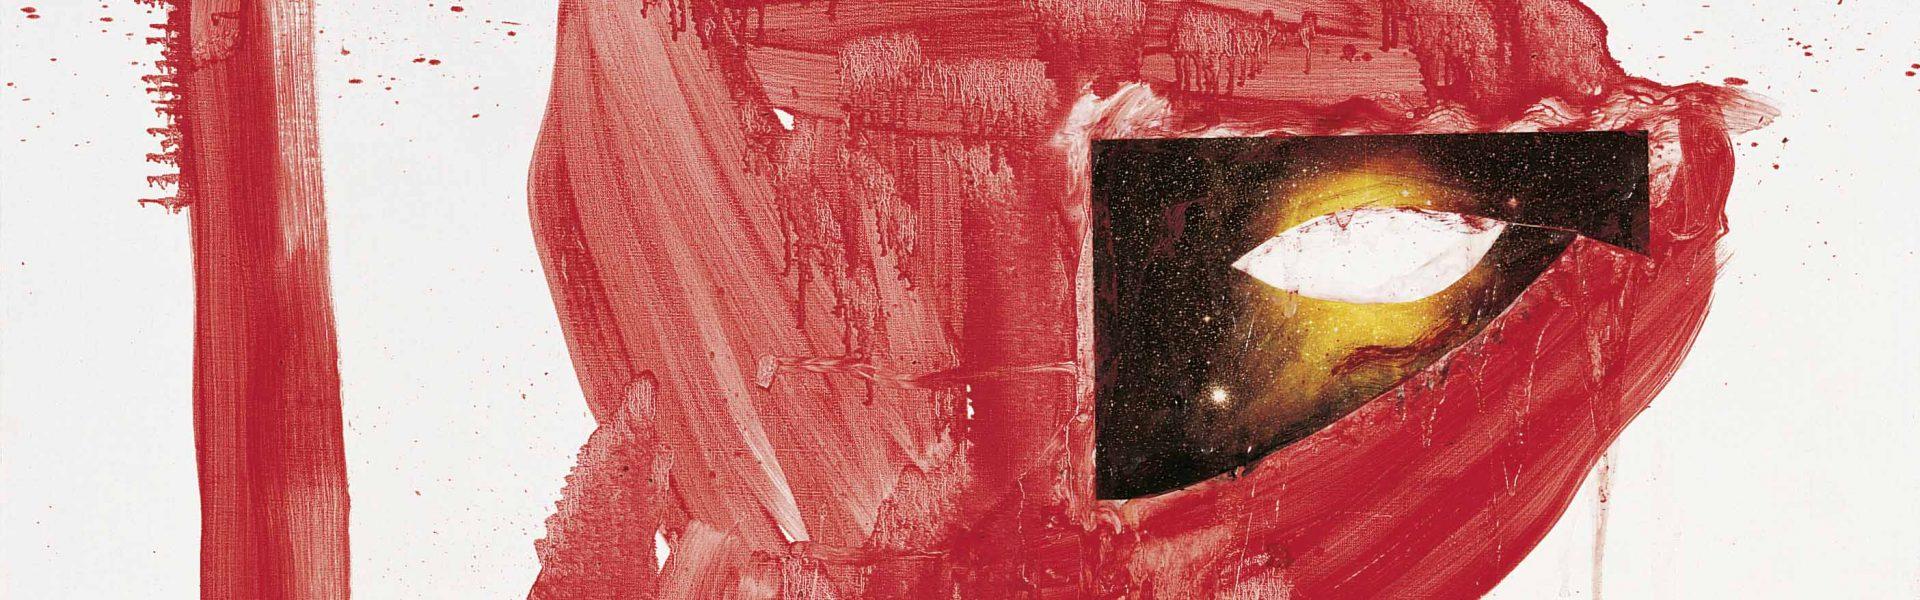 "Jonathan Meese JAPANISCHE TASCHE ""HERRMEESEL"", Öl und Mixed Media auf Leinwand, 210 x 140 x 2,4 cm, Photo: Jochen Littkemann © Jonathan Meese/VG Bild-Kunst, Bonn 2018"